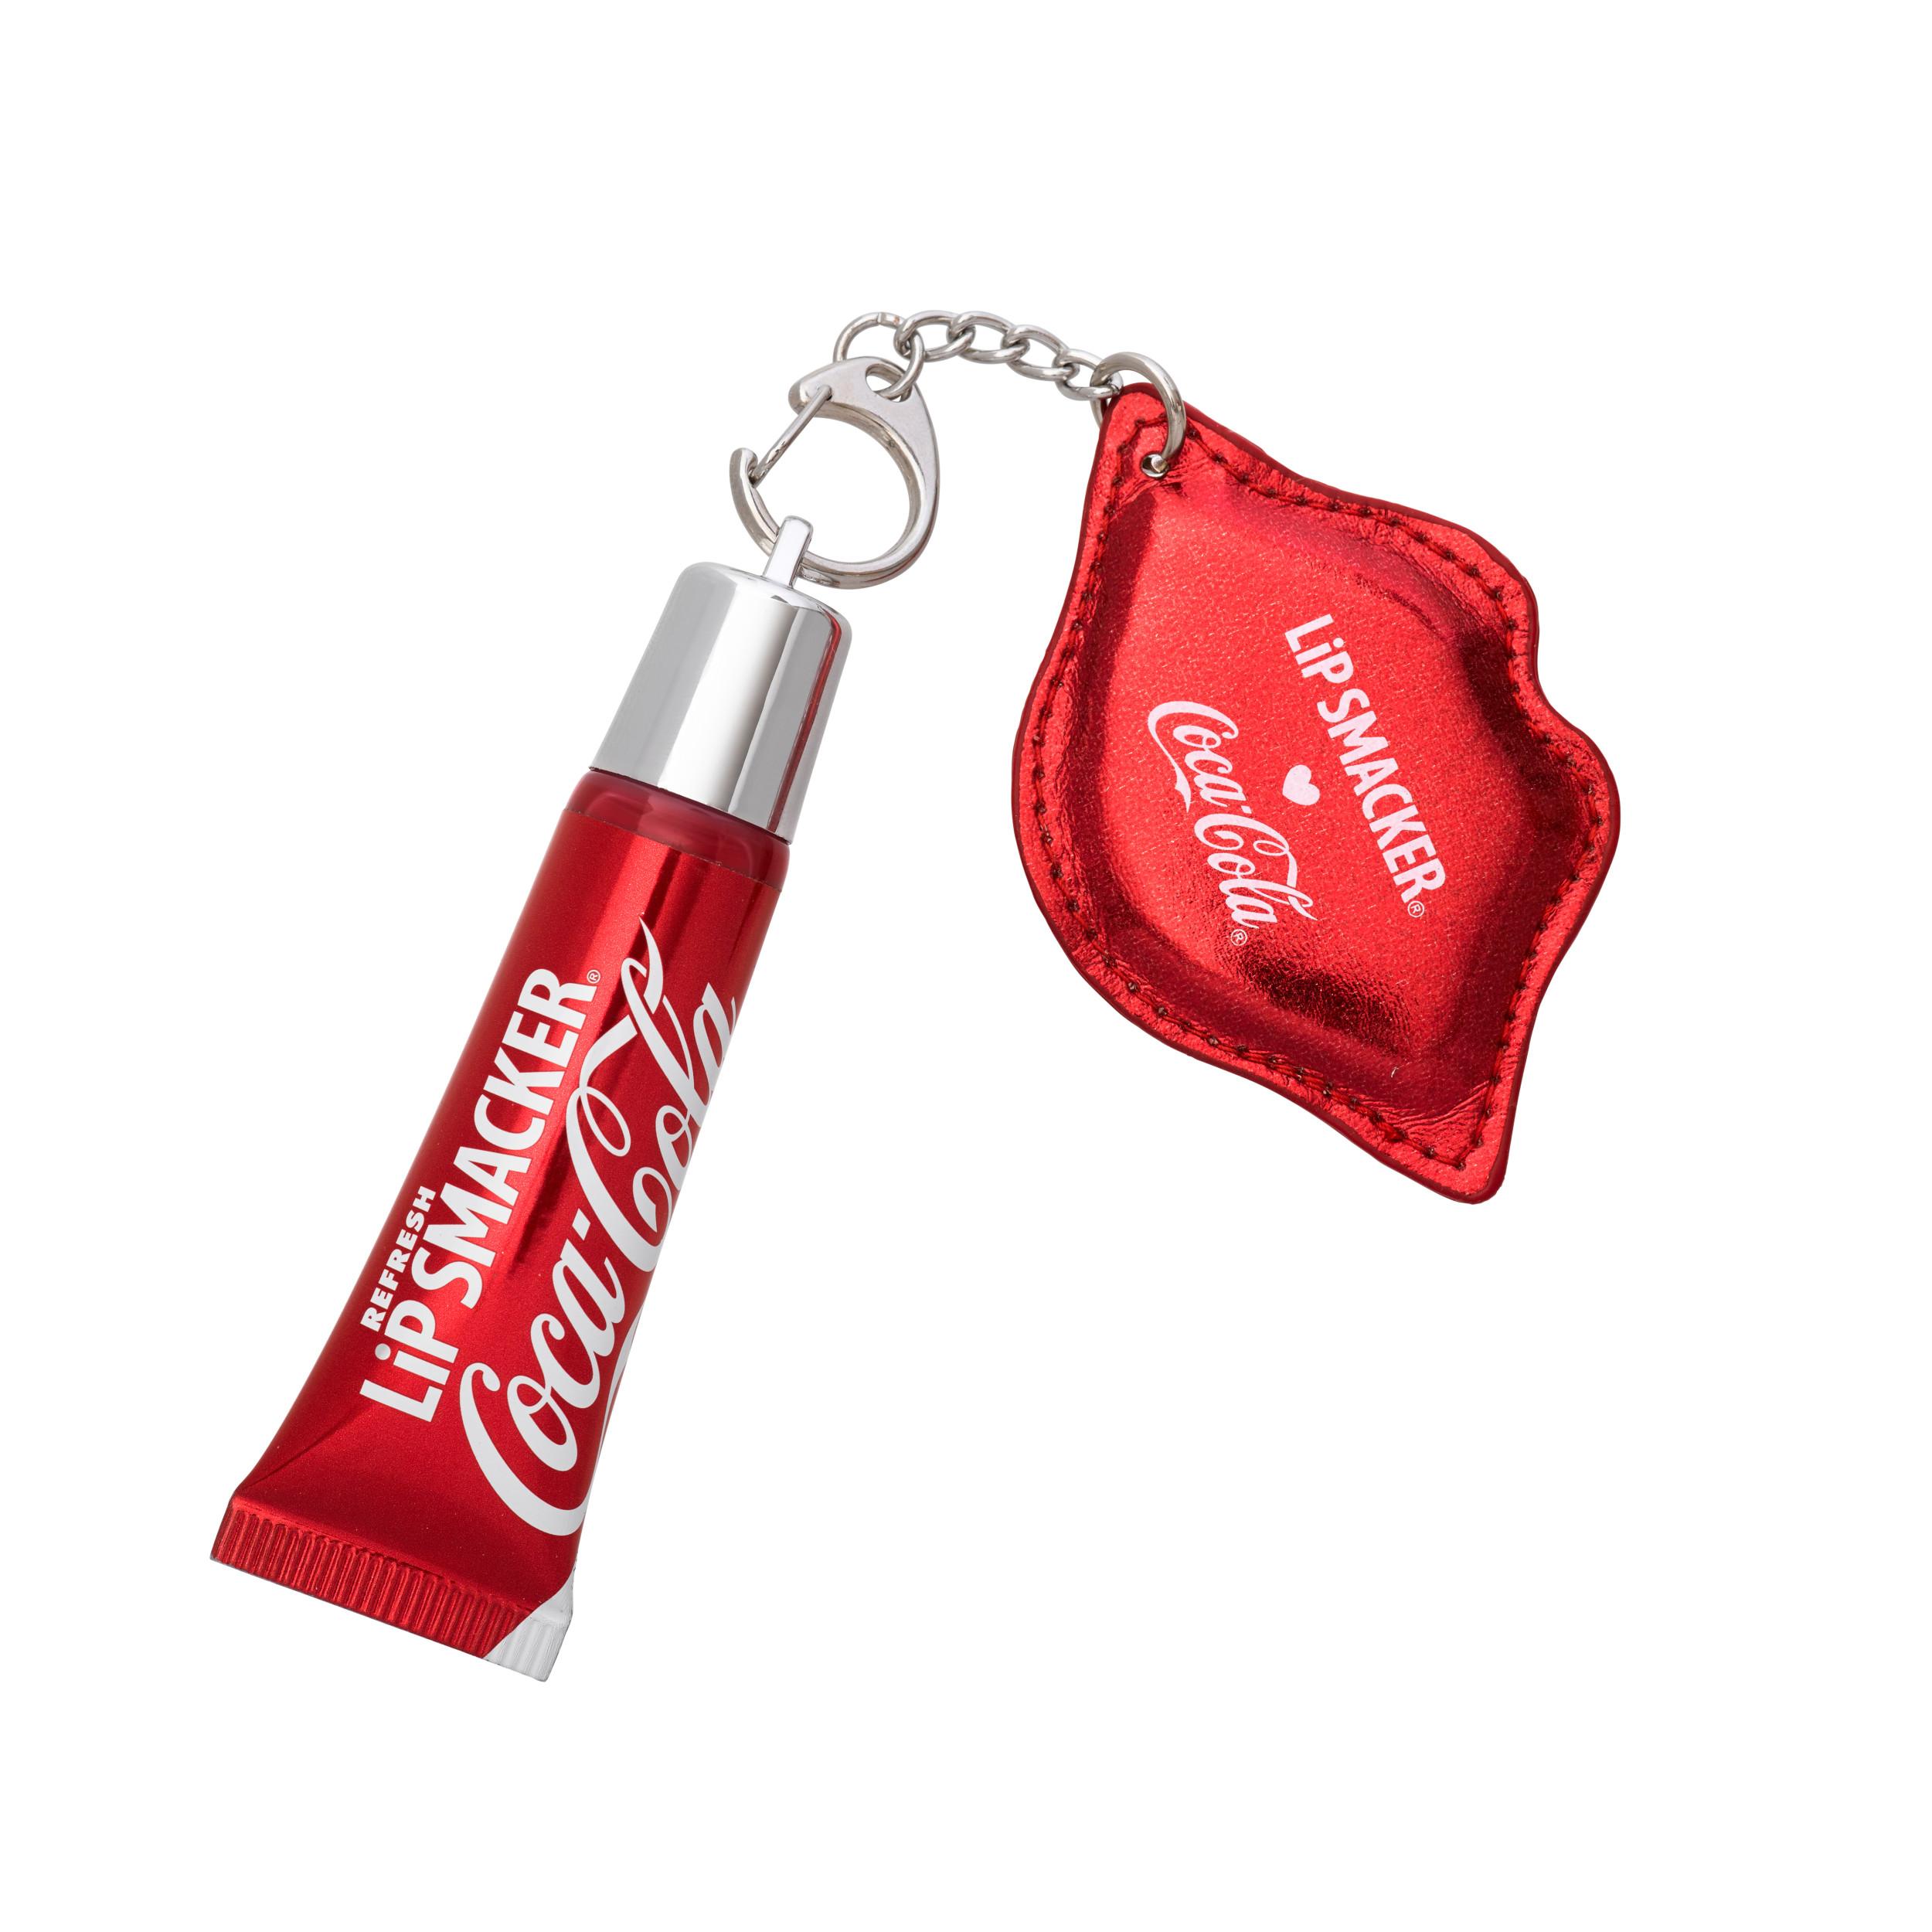 (2 Pack) Lip Smacker Coca-Cola Refresh Lip Gloss with Keychain